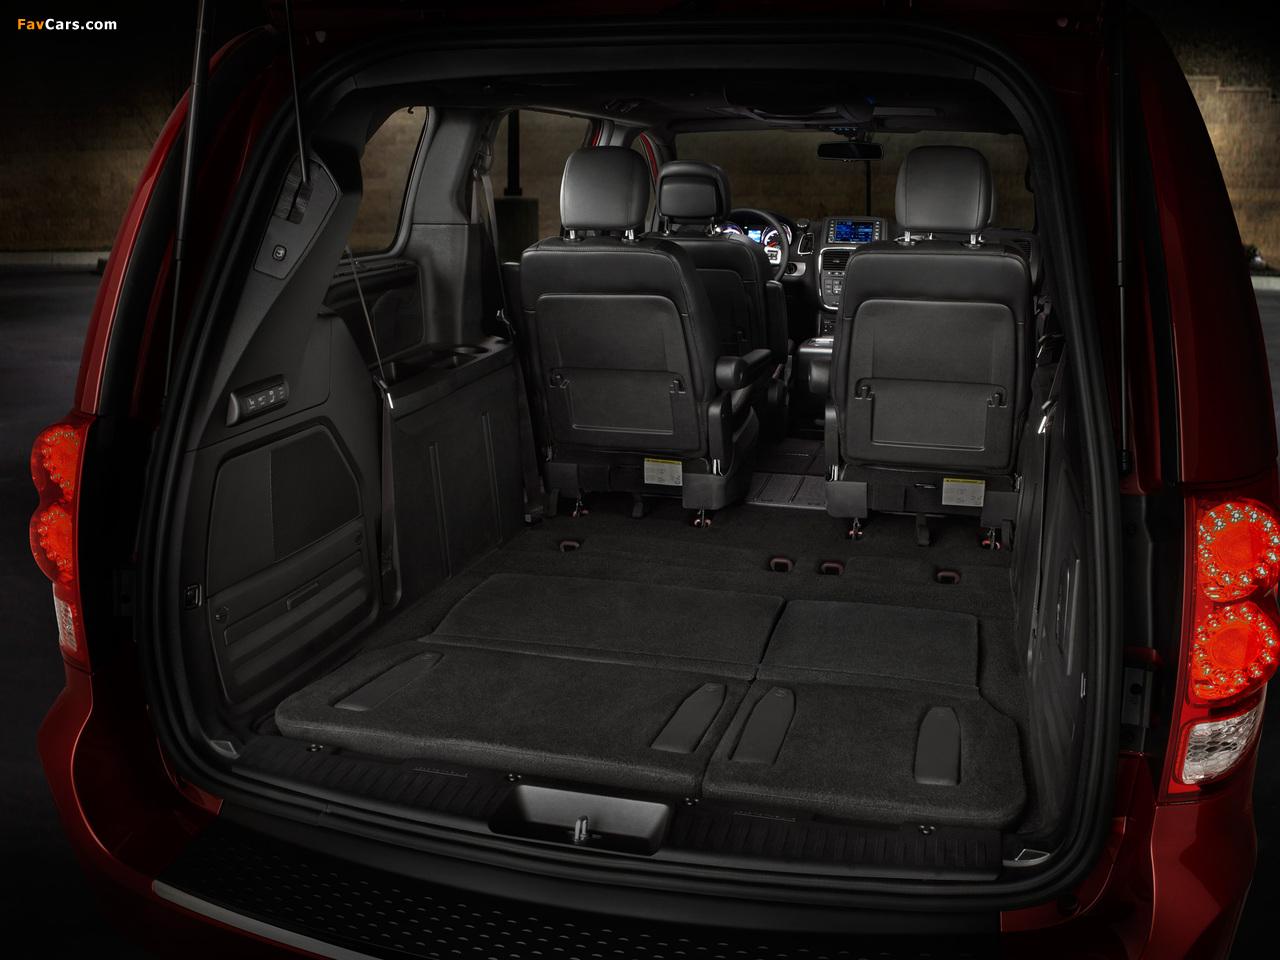 Dodge Grand Caravan R/T 2011 pictures (1280 x 960)